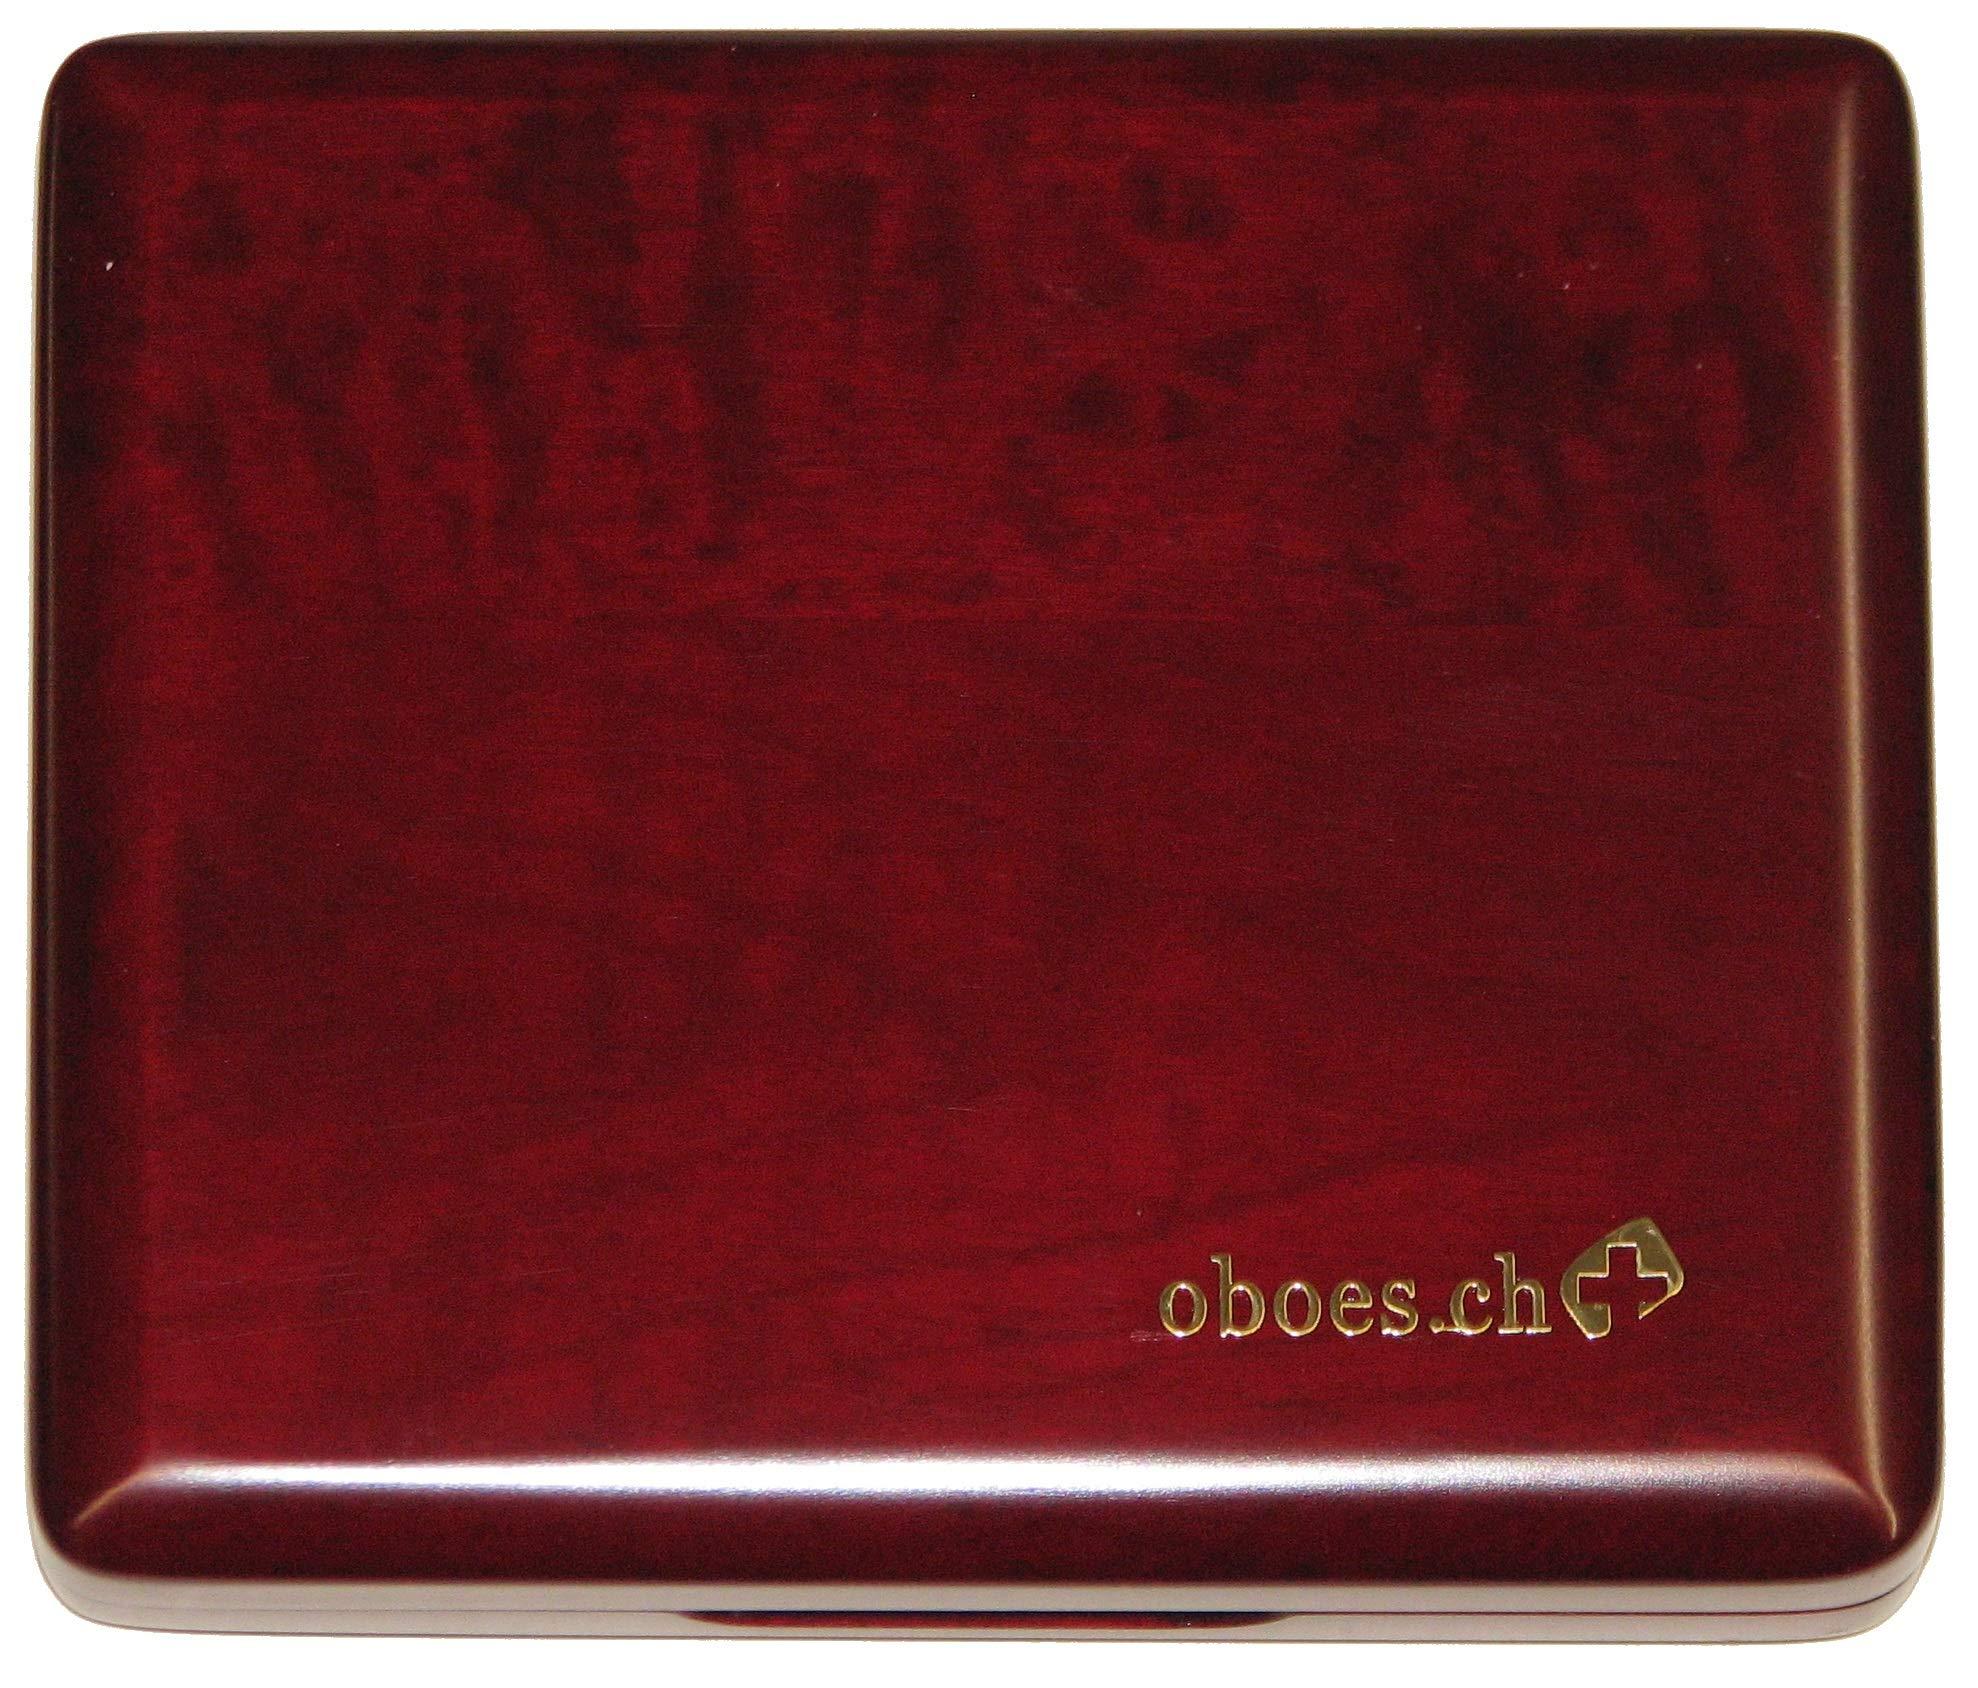 10-Reed Oboe Reed Case Wood Padauk by Oboes.ch